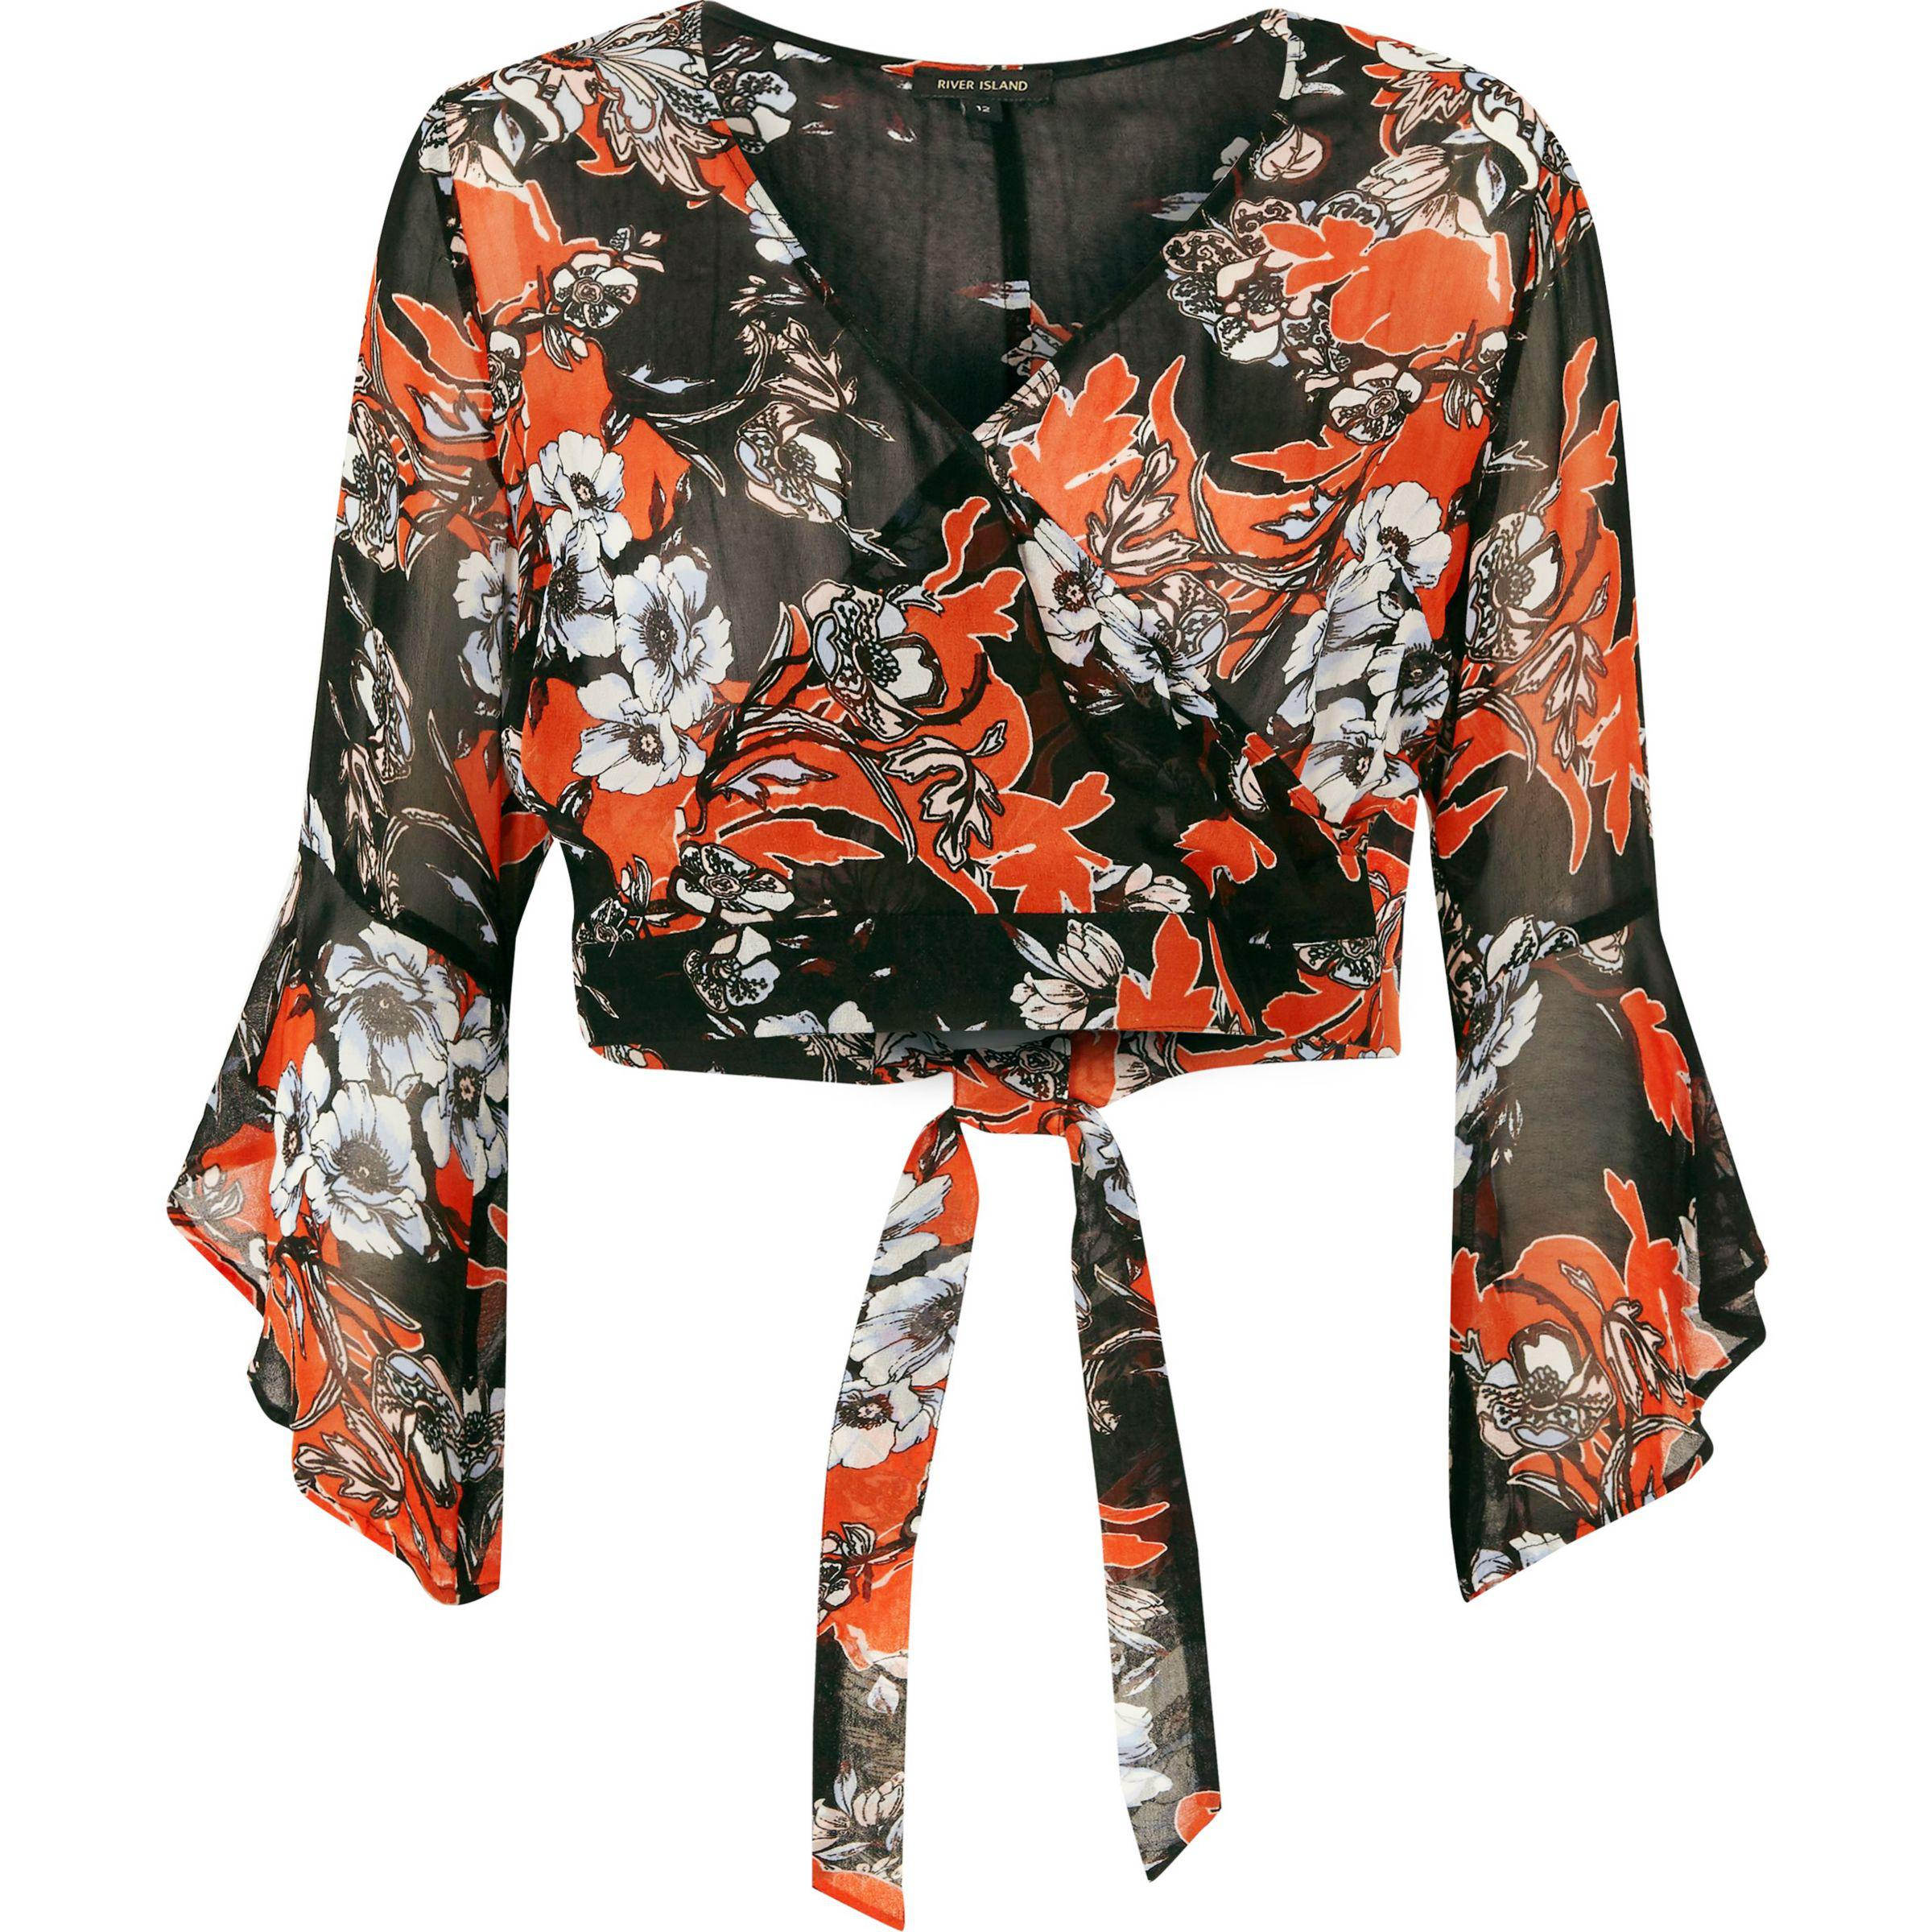 26251b8cf654c Lyst - River Island Black Floral Print Bell Sleeve Wrap Crop Top in ...